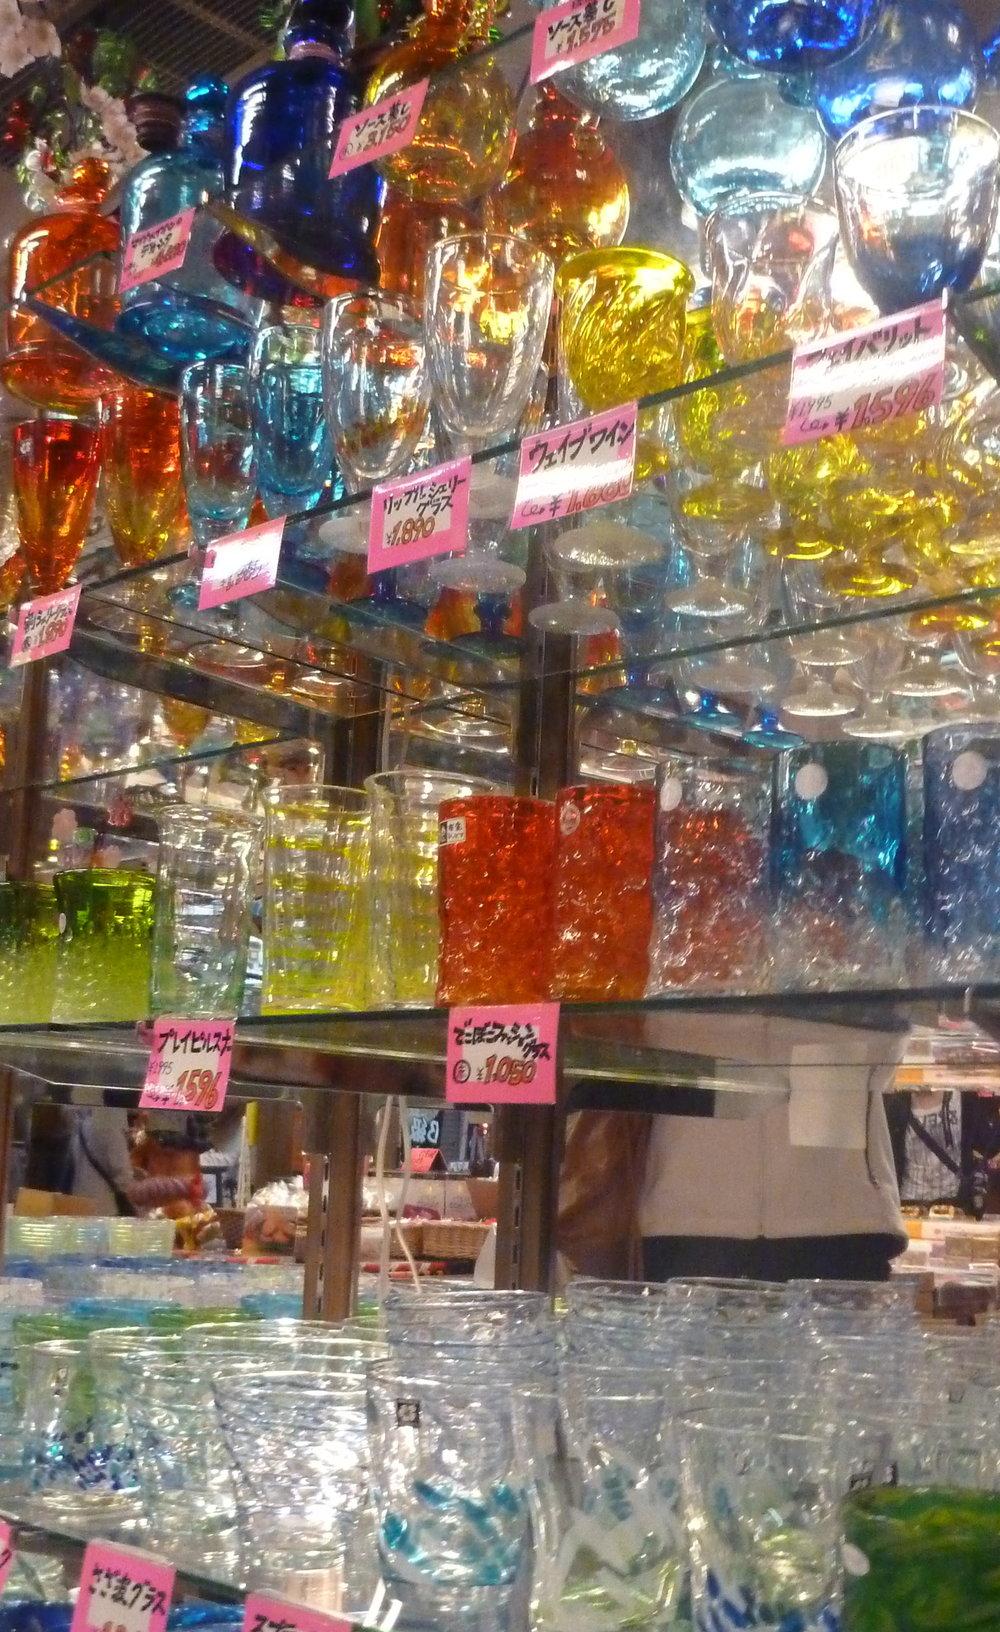 Display case with Ryukyuan Glassware. Okinawa, Japan